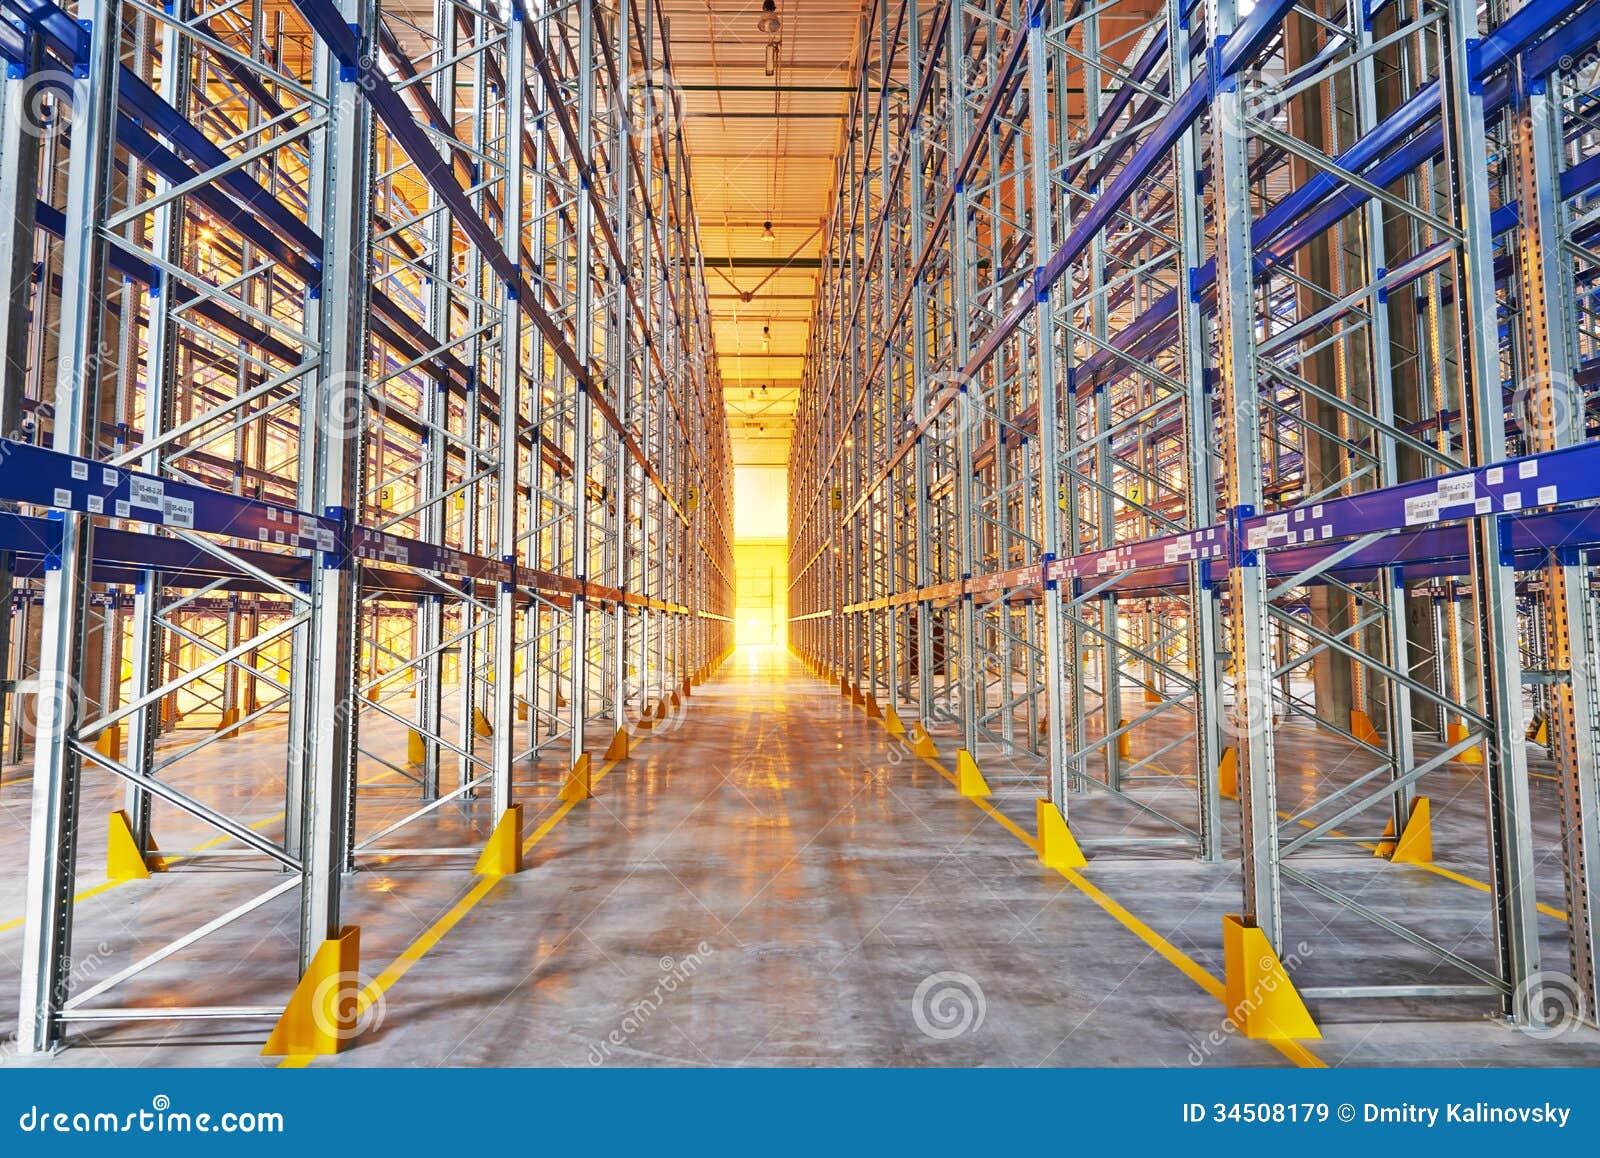 warehouse rack palletrack pallet palletrackandshelvingunits heavy category units duty